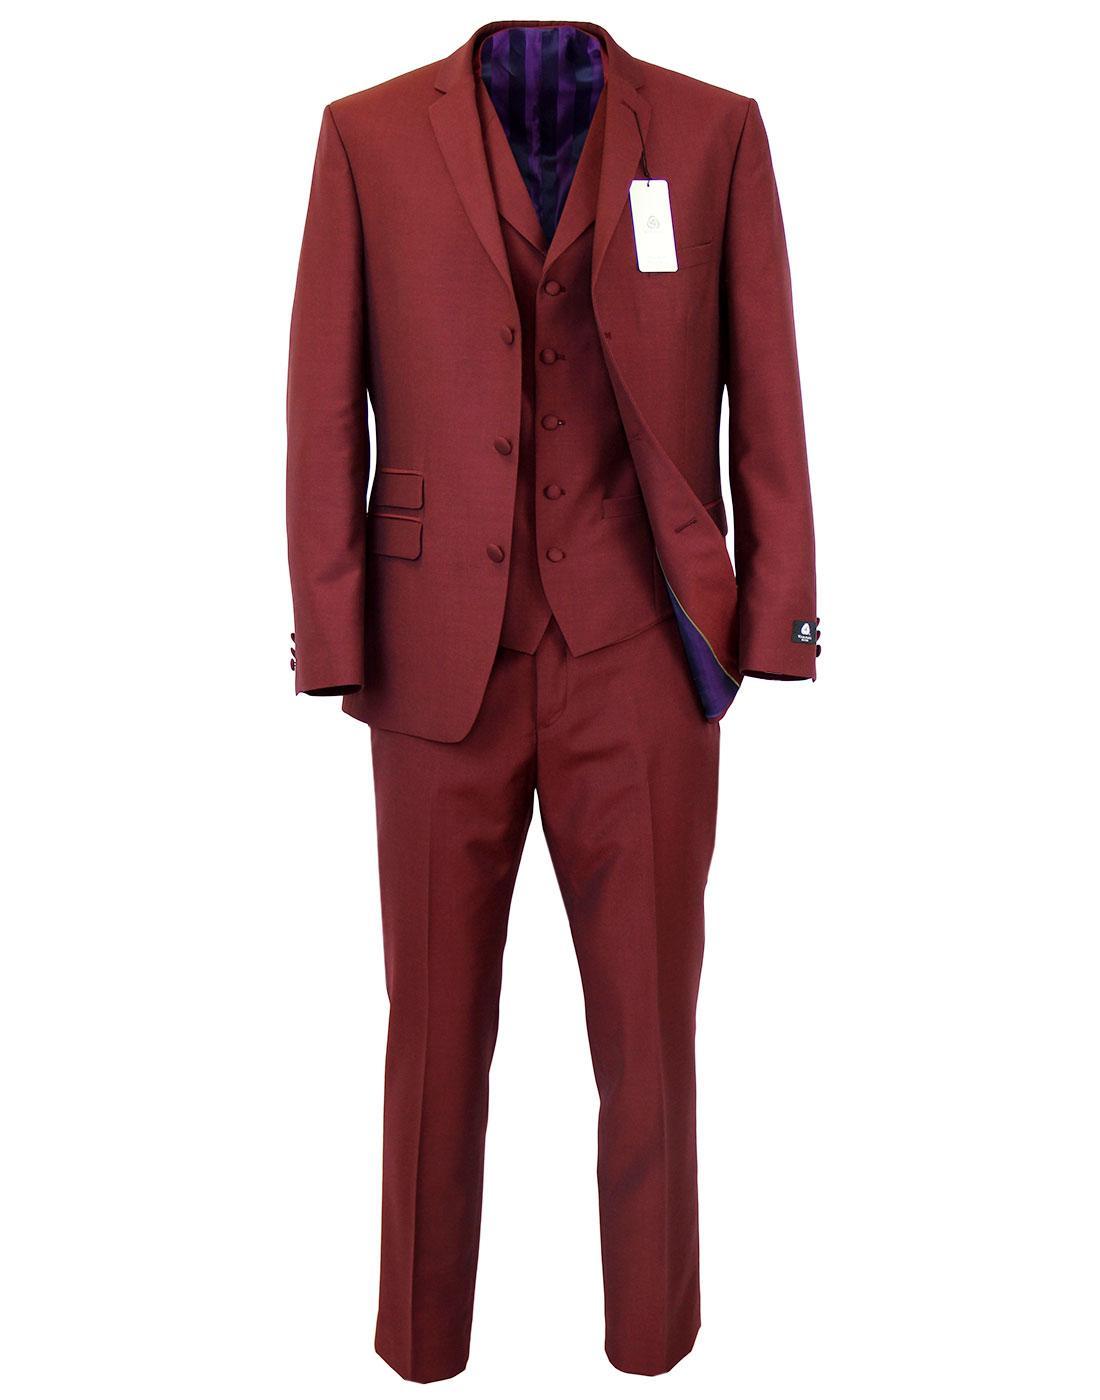 Madcap England Retro Mod 3 Piece Mohair Suit